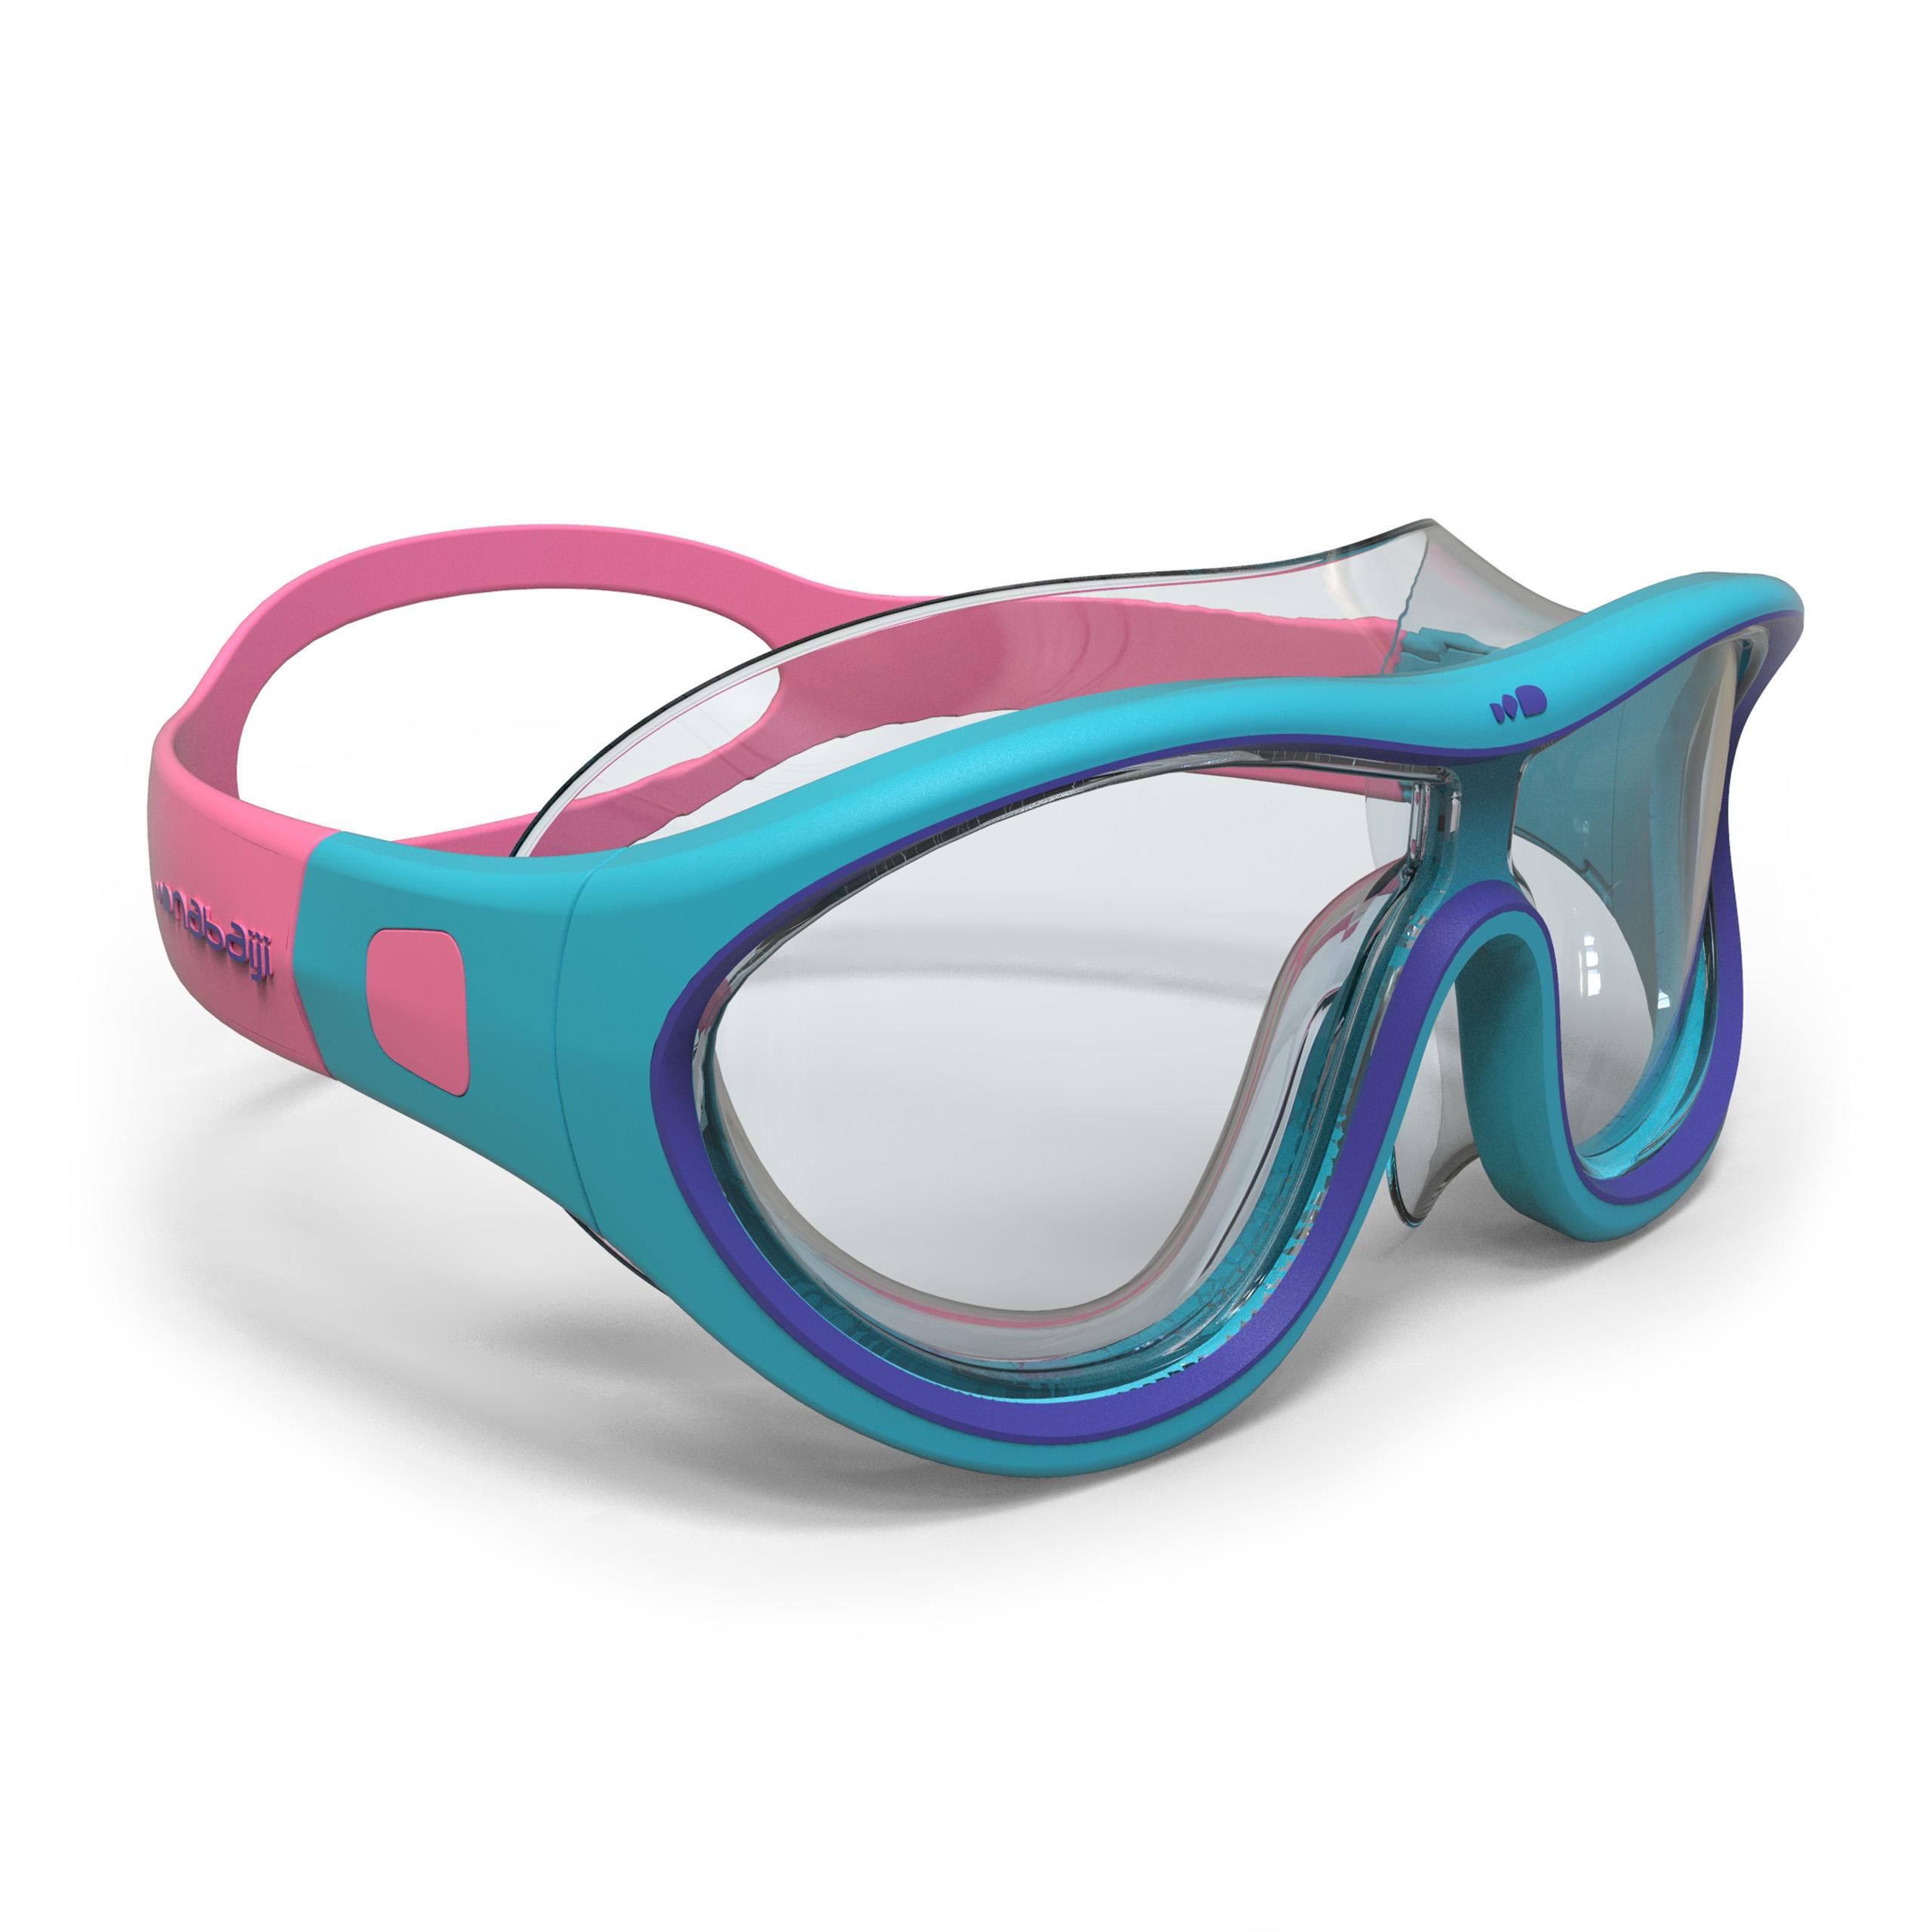 Ochelari Înot Swimdow 100 S